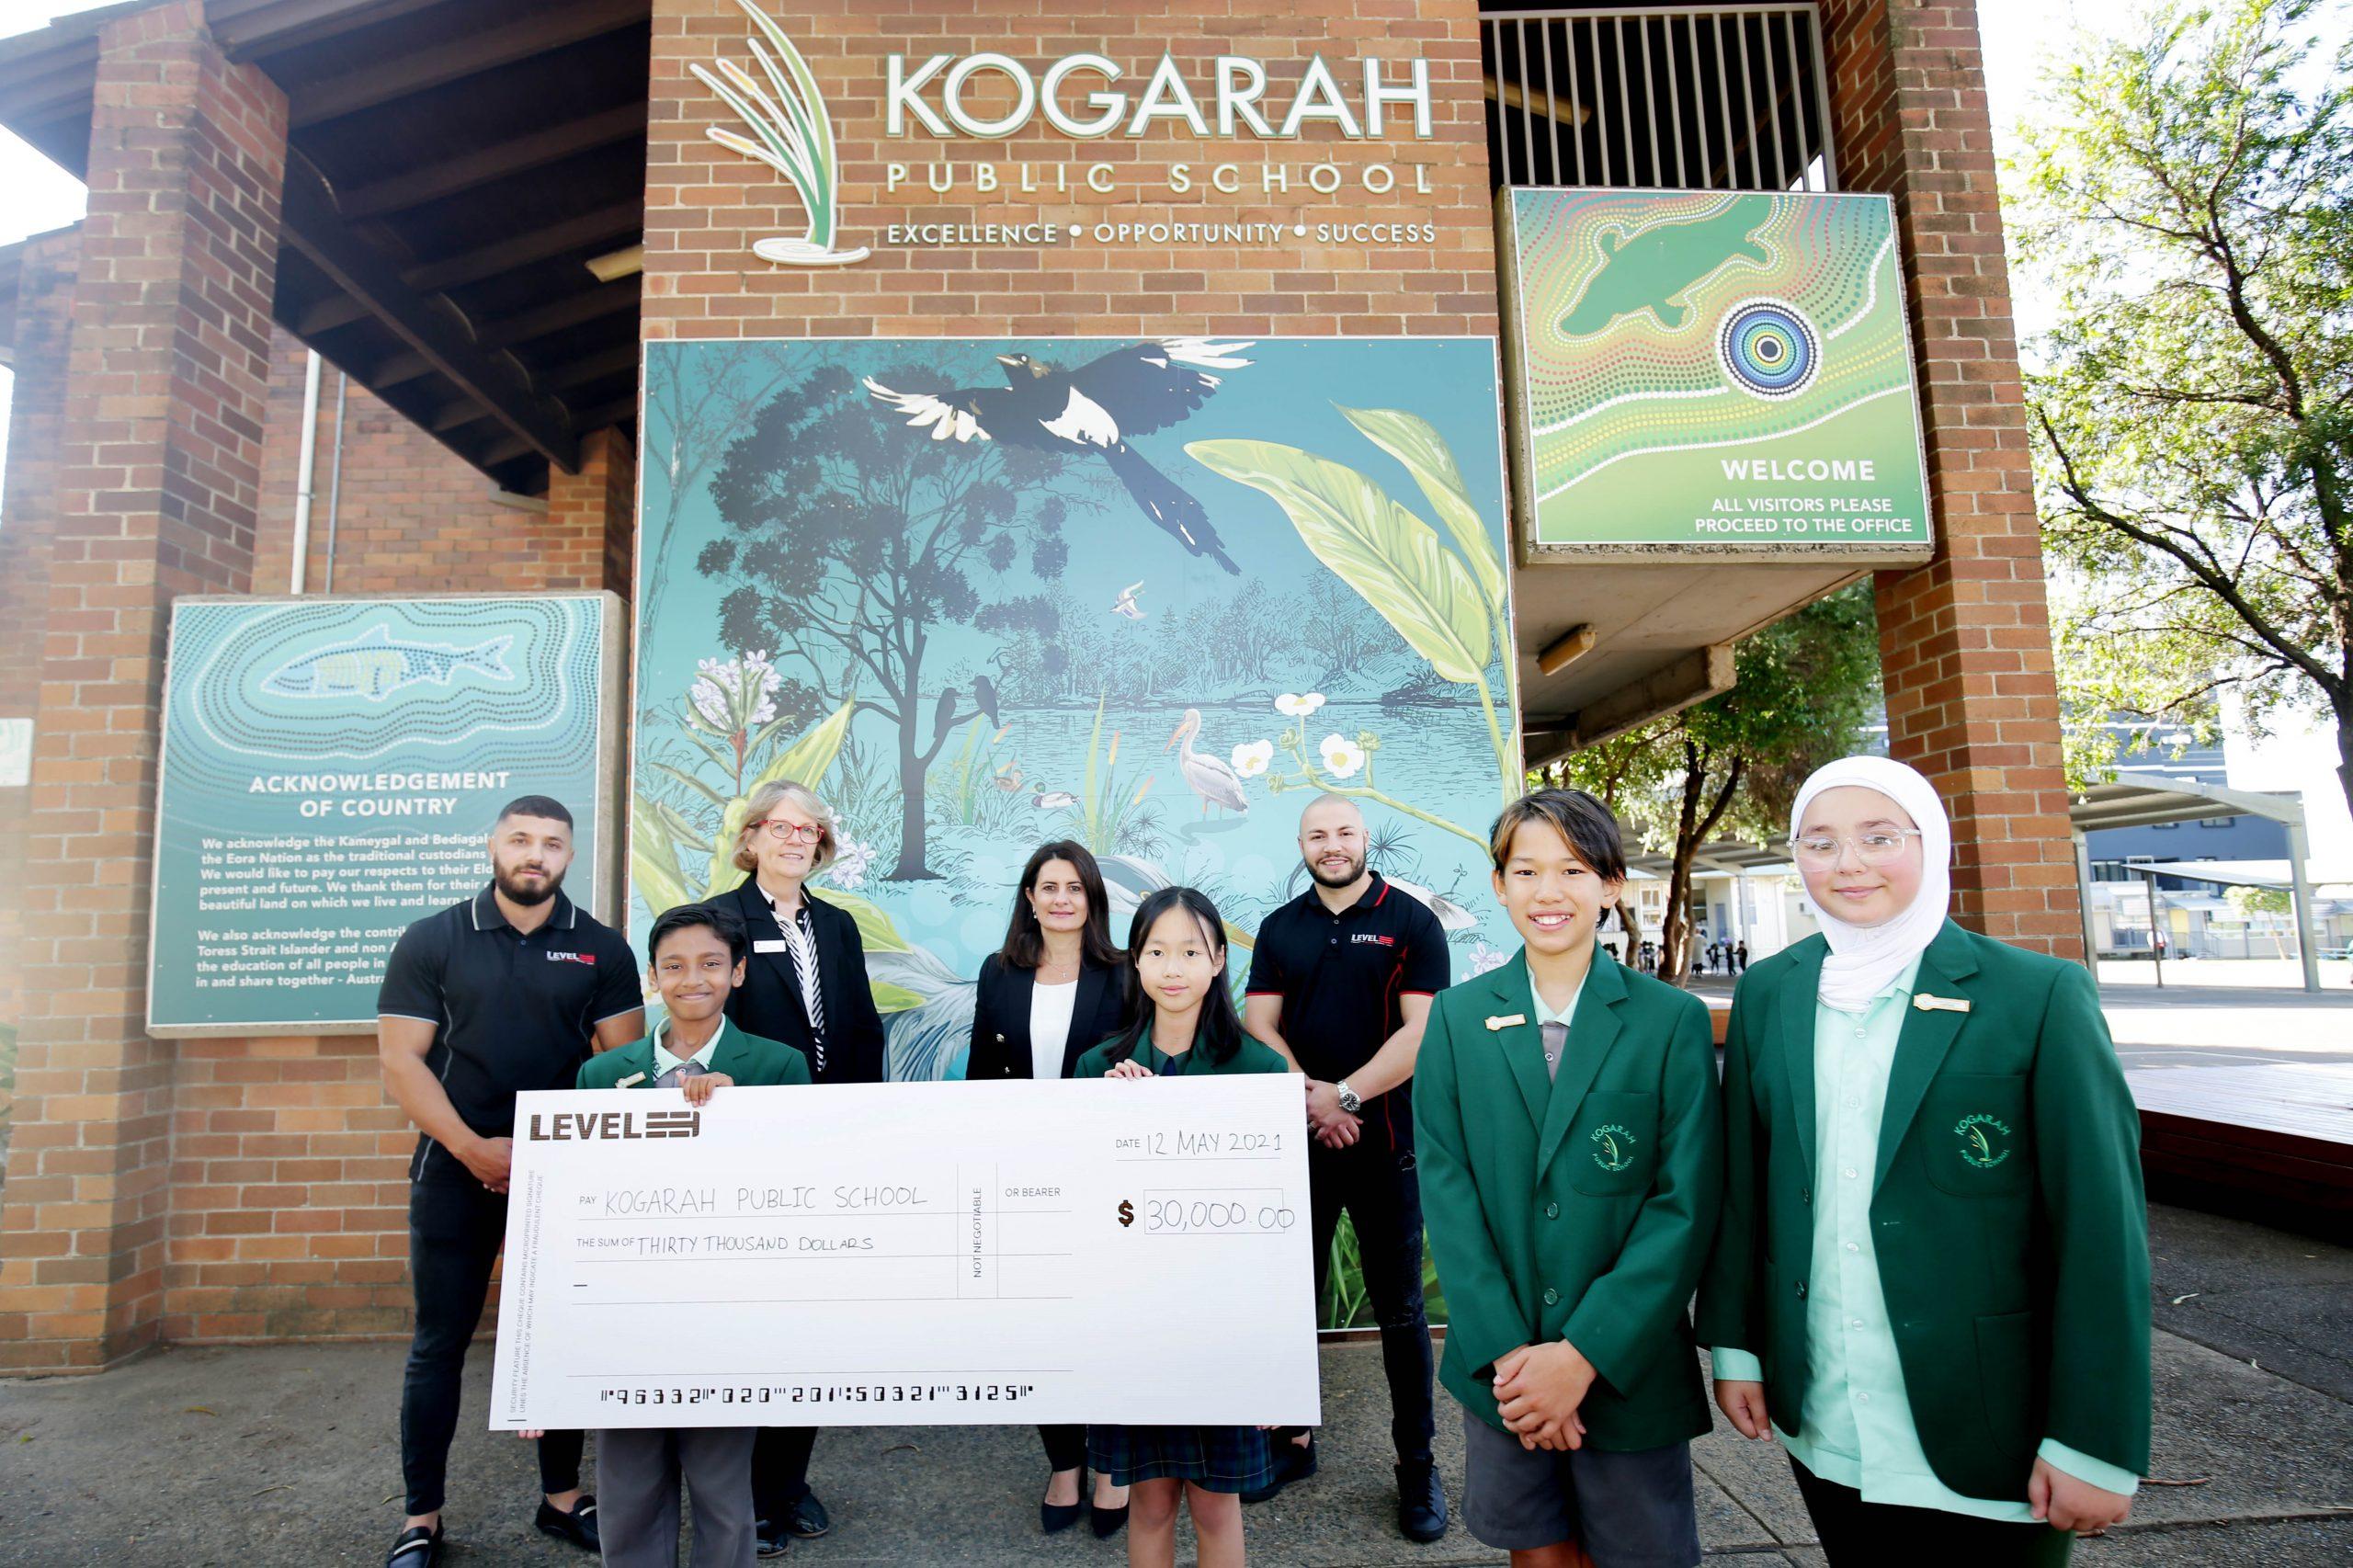 "Level 33 donates $30,000 to  Kogarah <span class=""pt_splitter pt_splitter-1"">Public School in a gesture of goodwill and community spirit</span>"